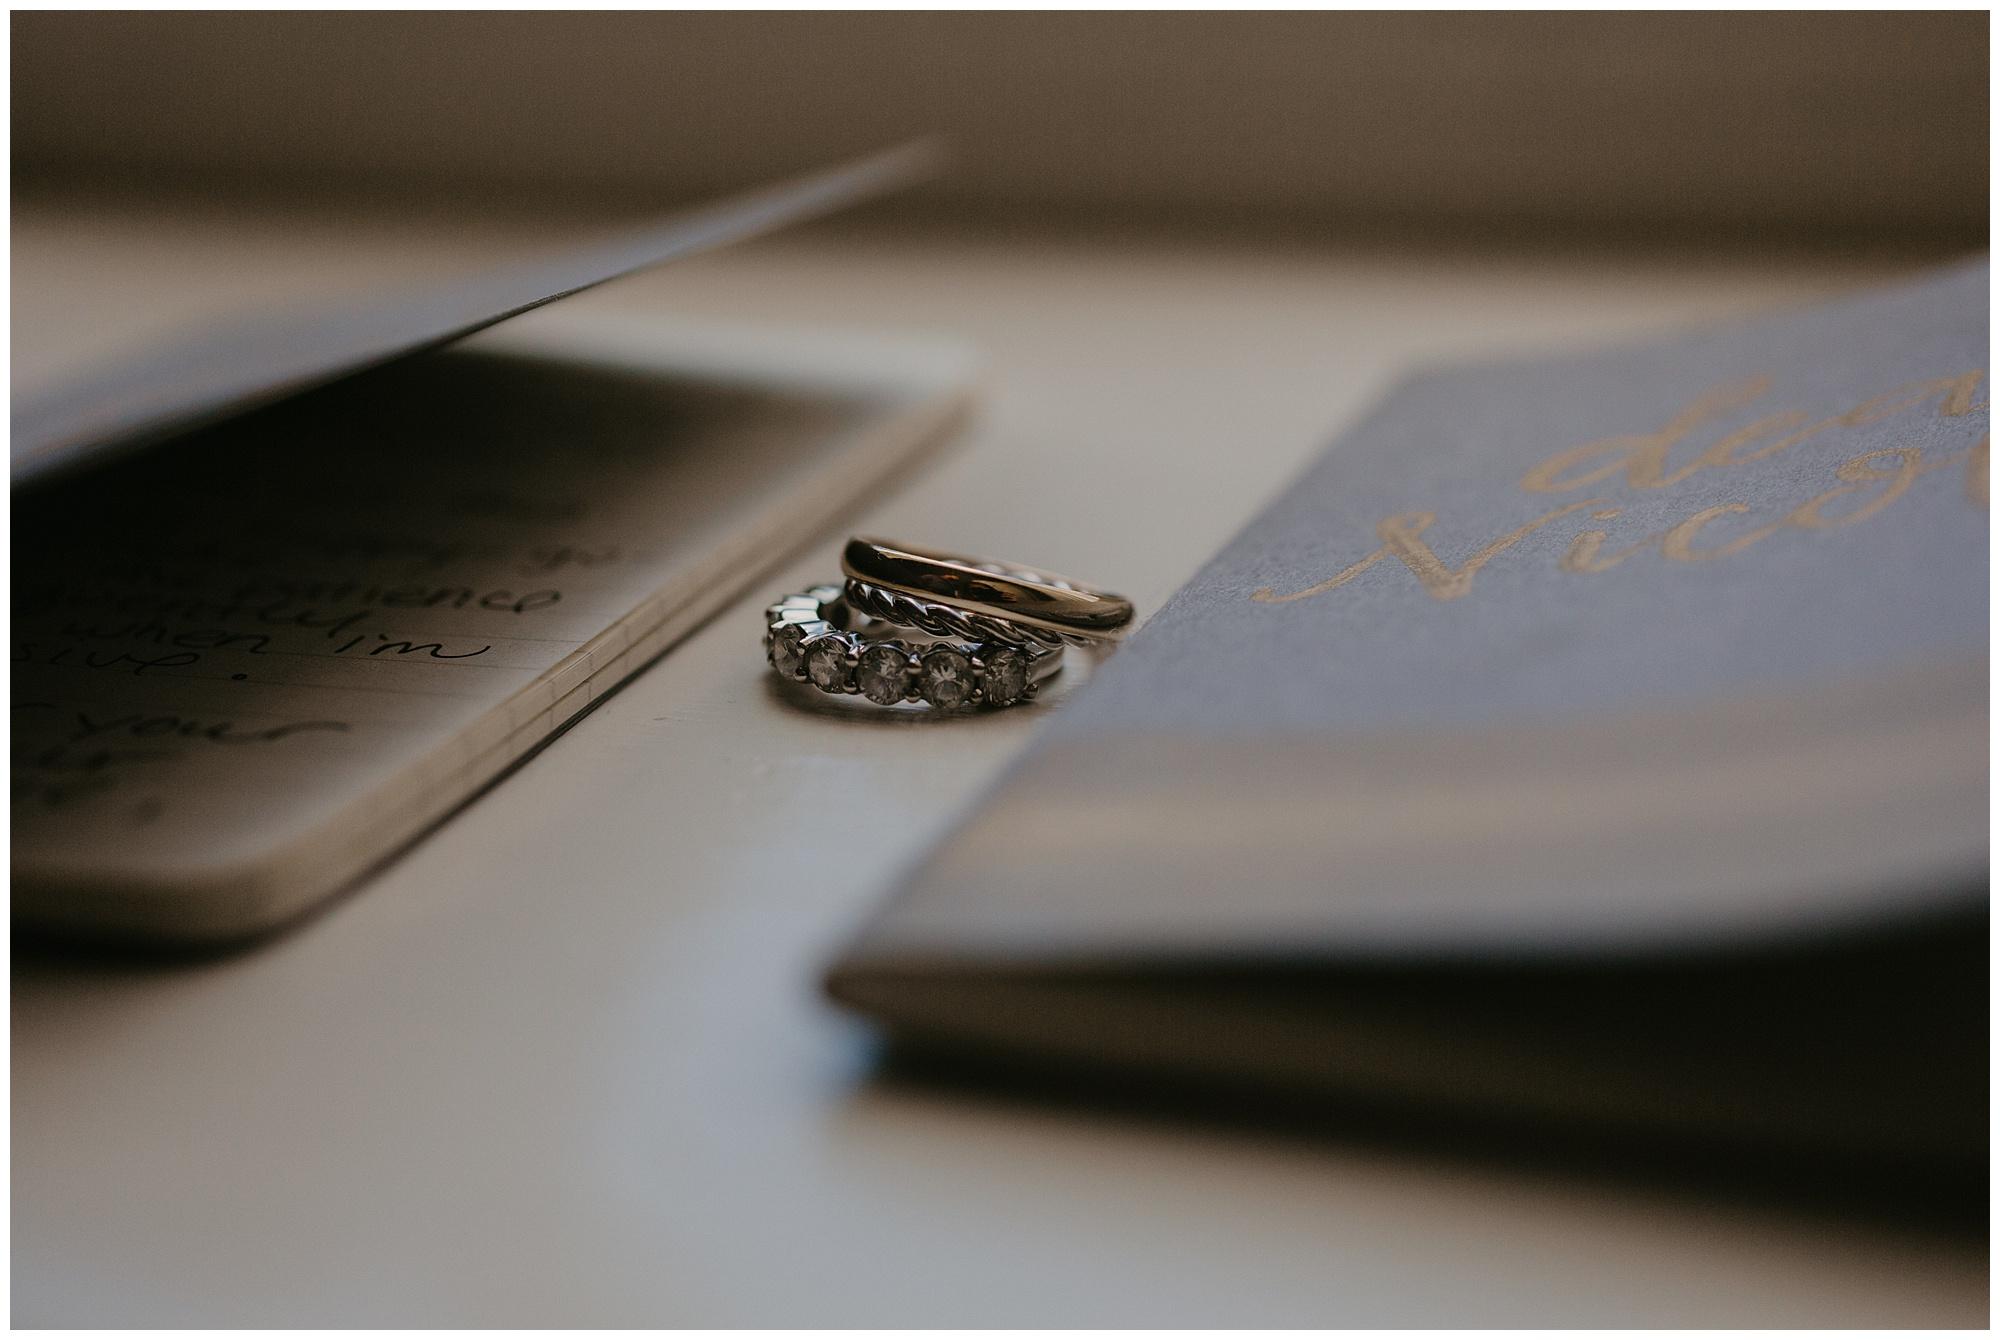 allerton_park_wedding_champaign_il_chicago_wright_photographs_ne_0040.jpg